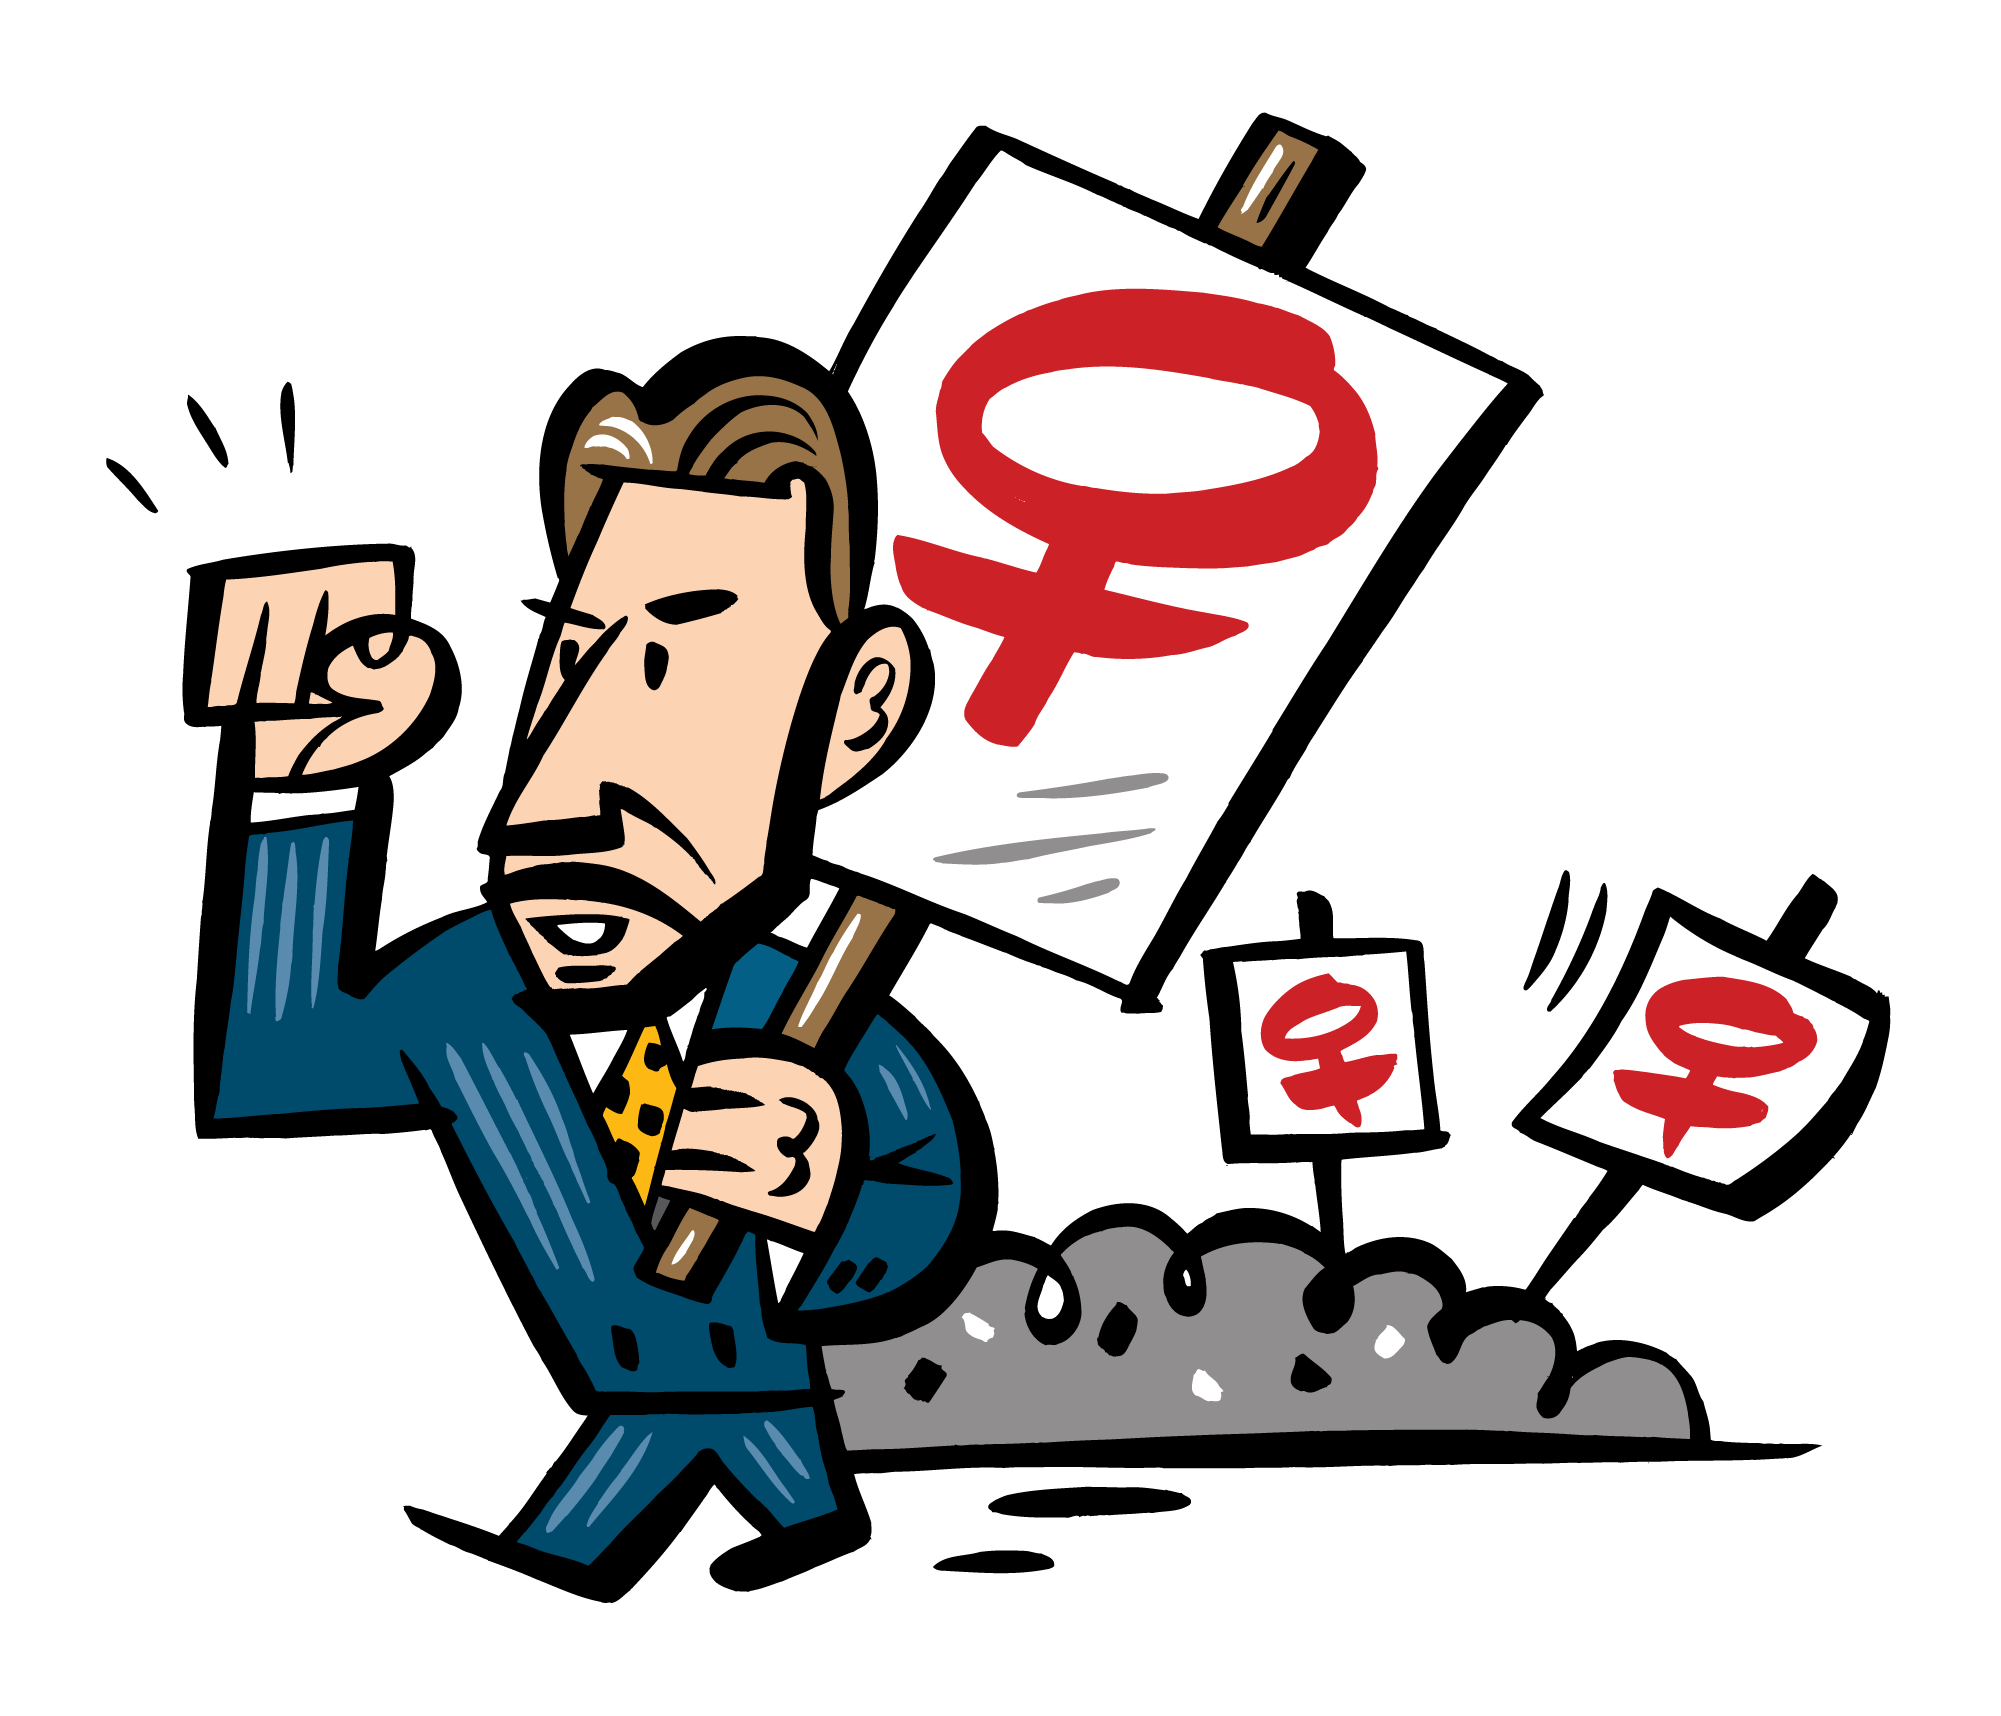 Larry Ellison Calls Himself a Feminist: Wall Street Journal